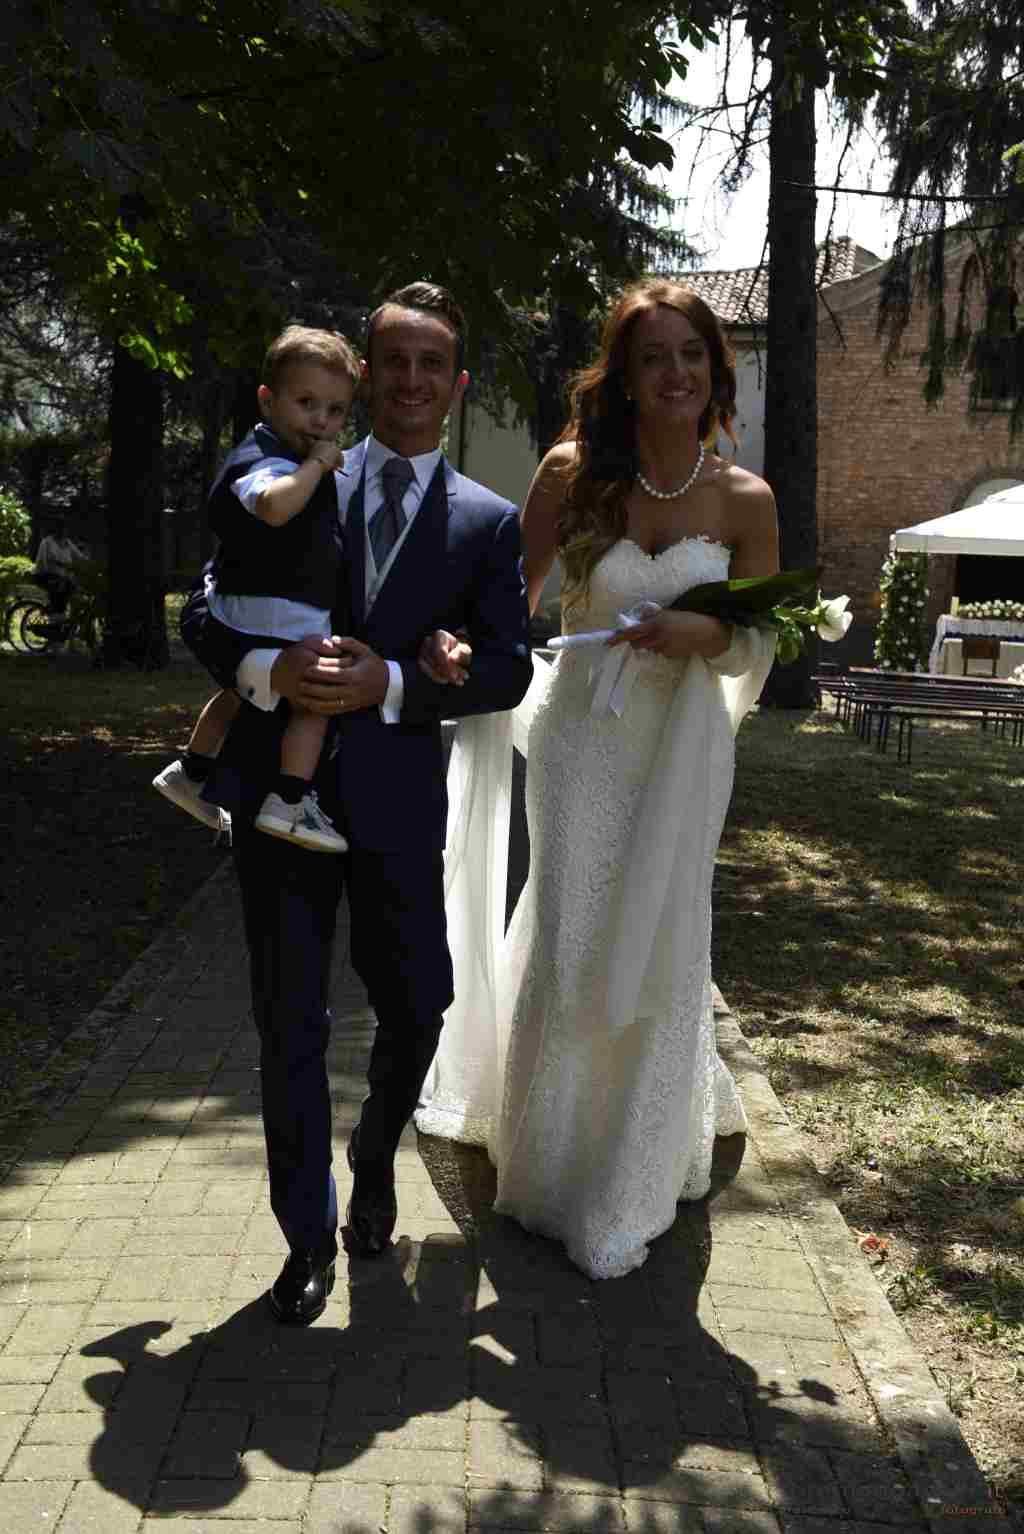 Matrimonio In Rissa Piacenza : Matrimonio fidenza piacenza rondanina francesco